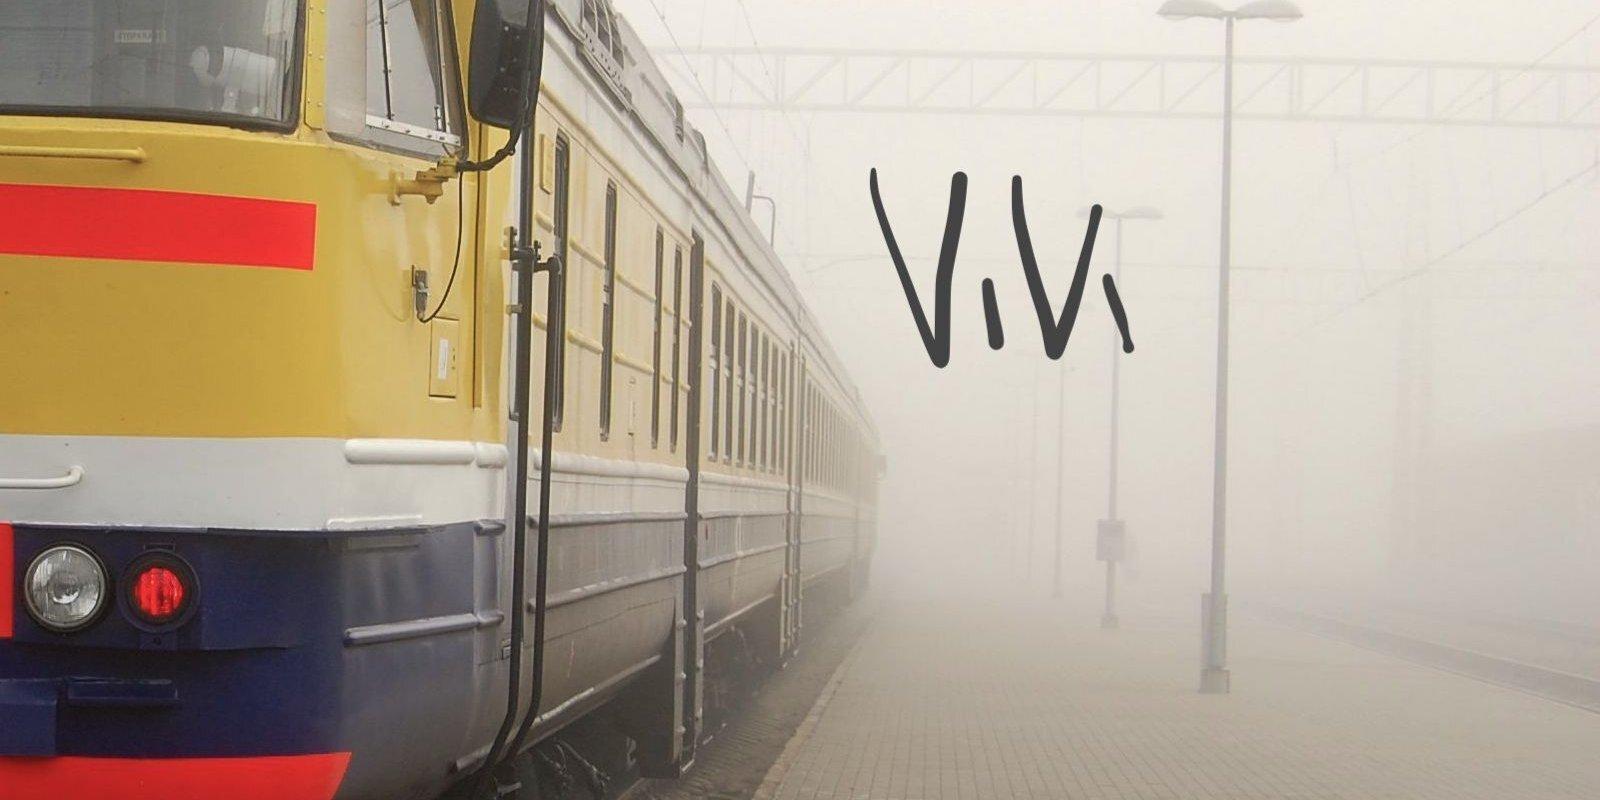 Cehs.lv: Tu nevienu neapmuļķosi, 'Pasažieru vilcien', mēs tevi pazīstam